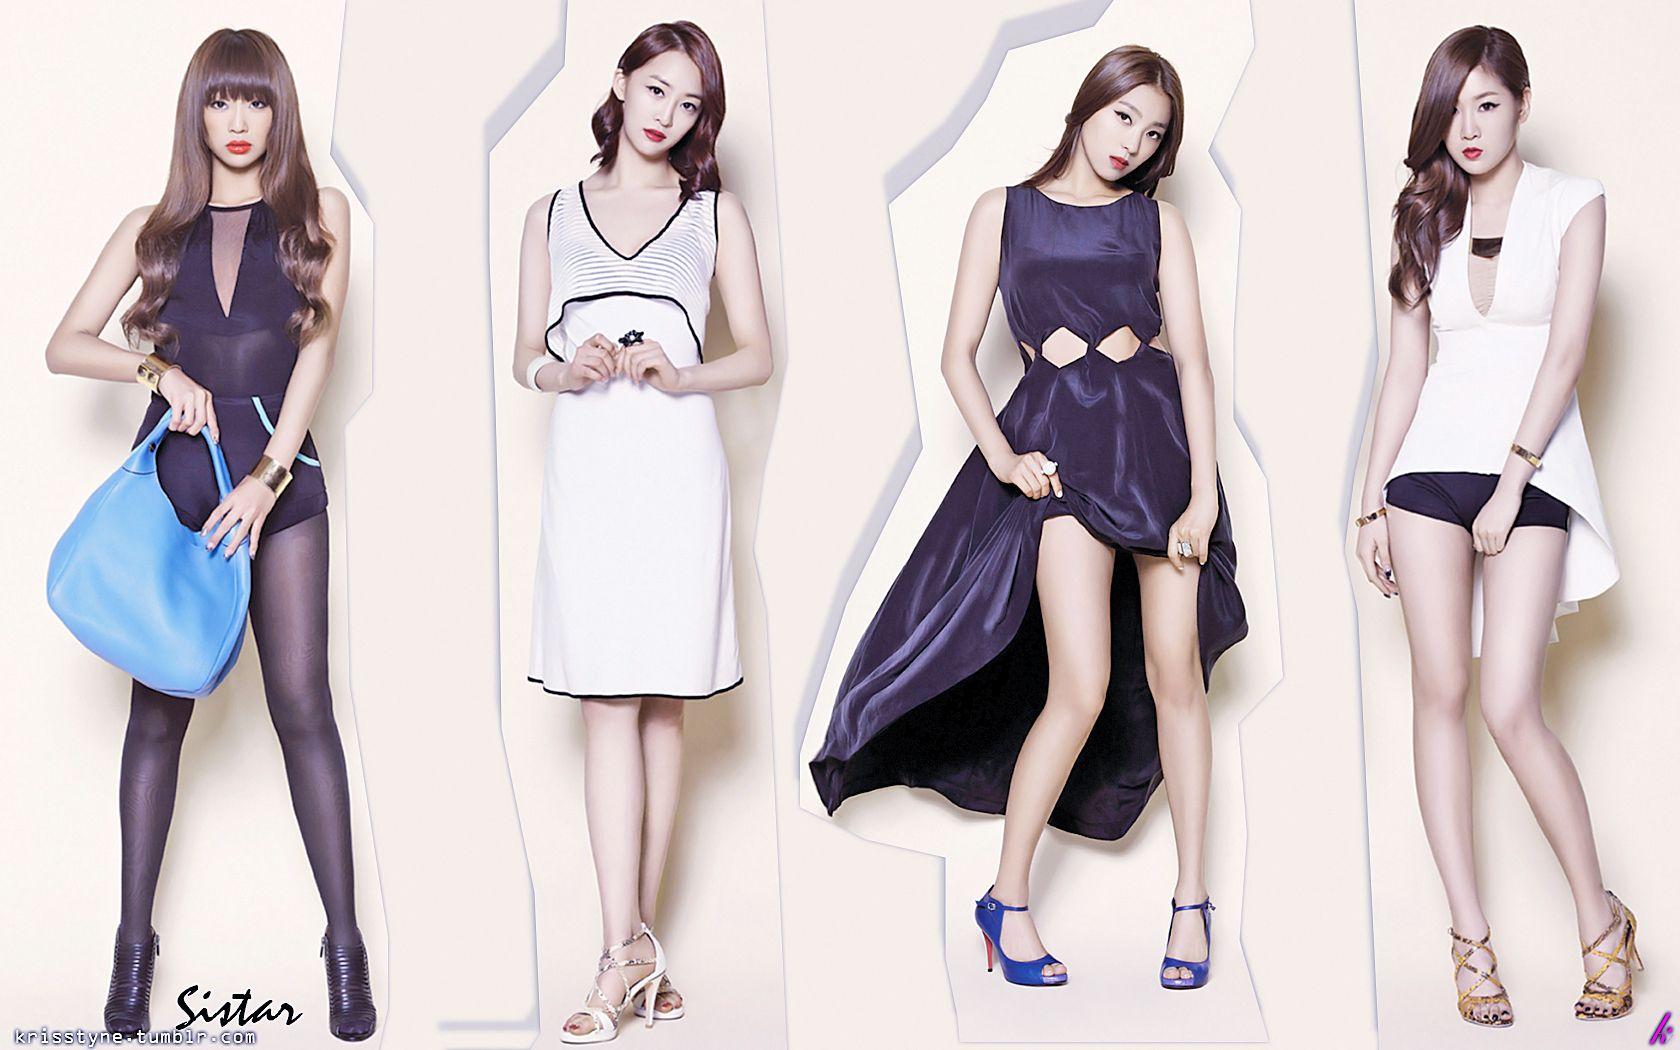 Google themes kpop - Sistar South Korean Girl Band Members Hyolyn Bora Soyou Dasom Kpop Sistar